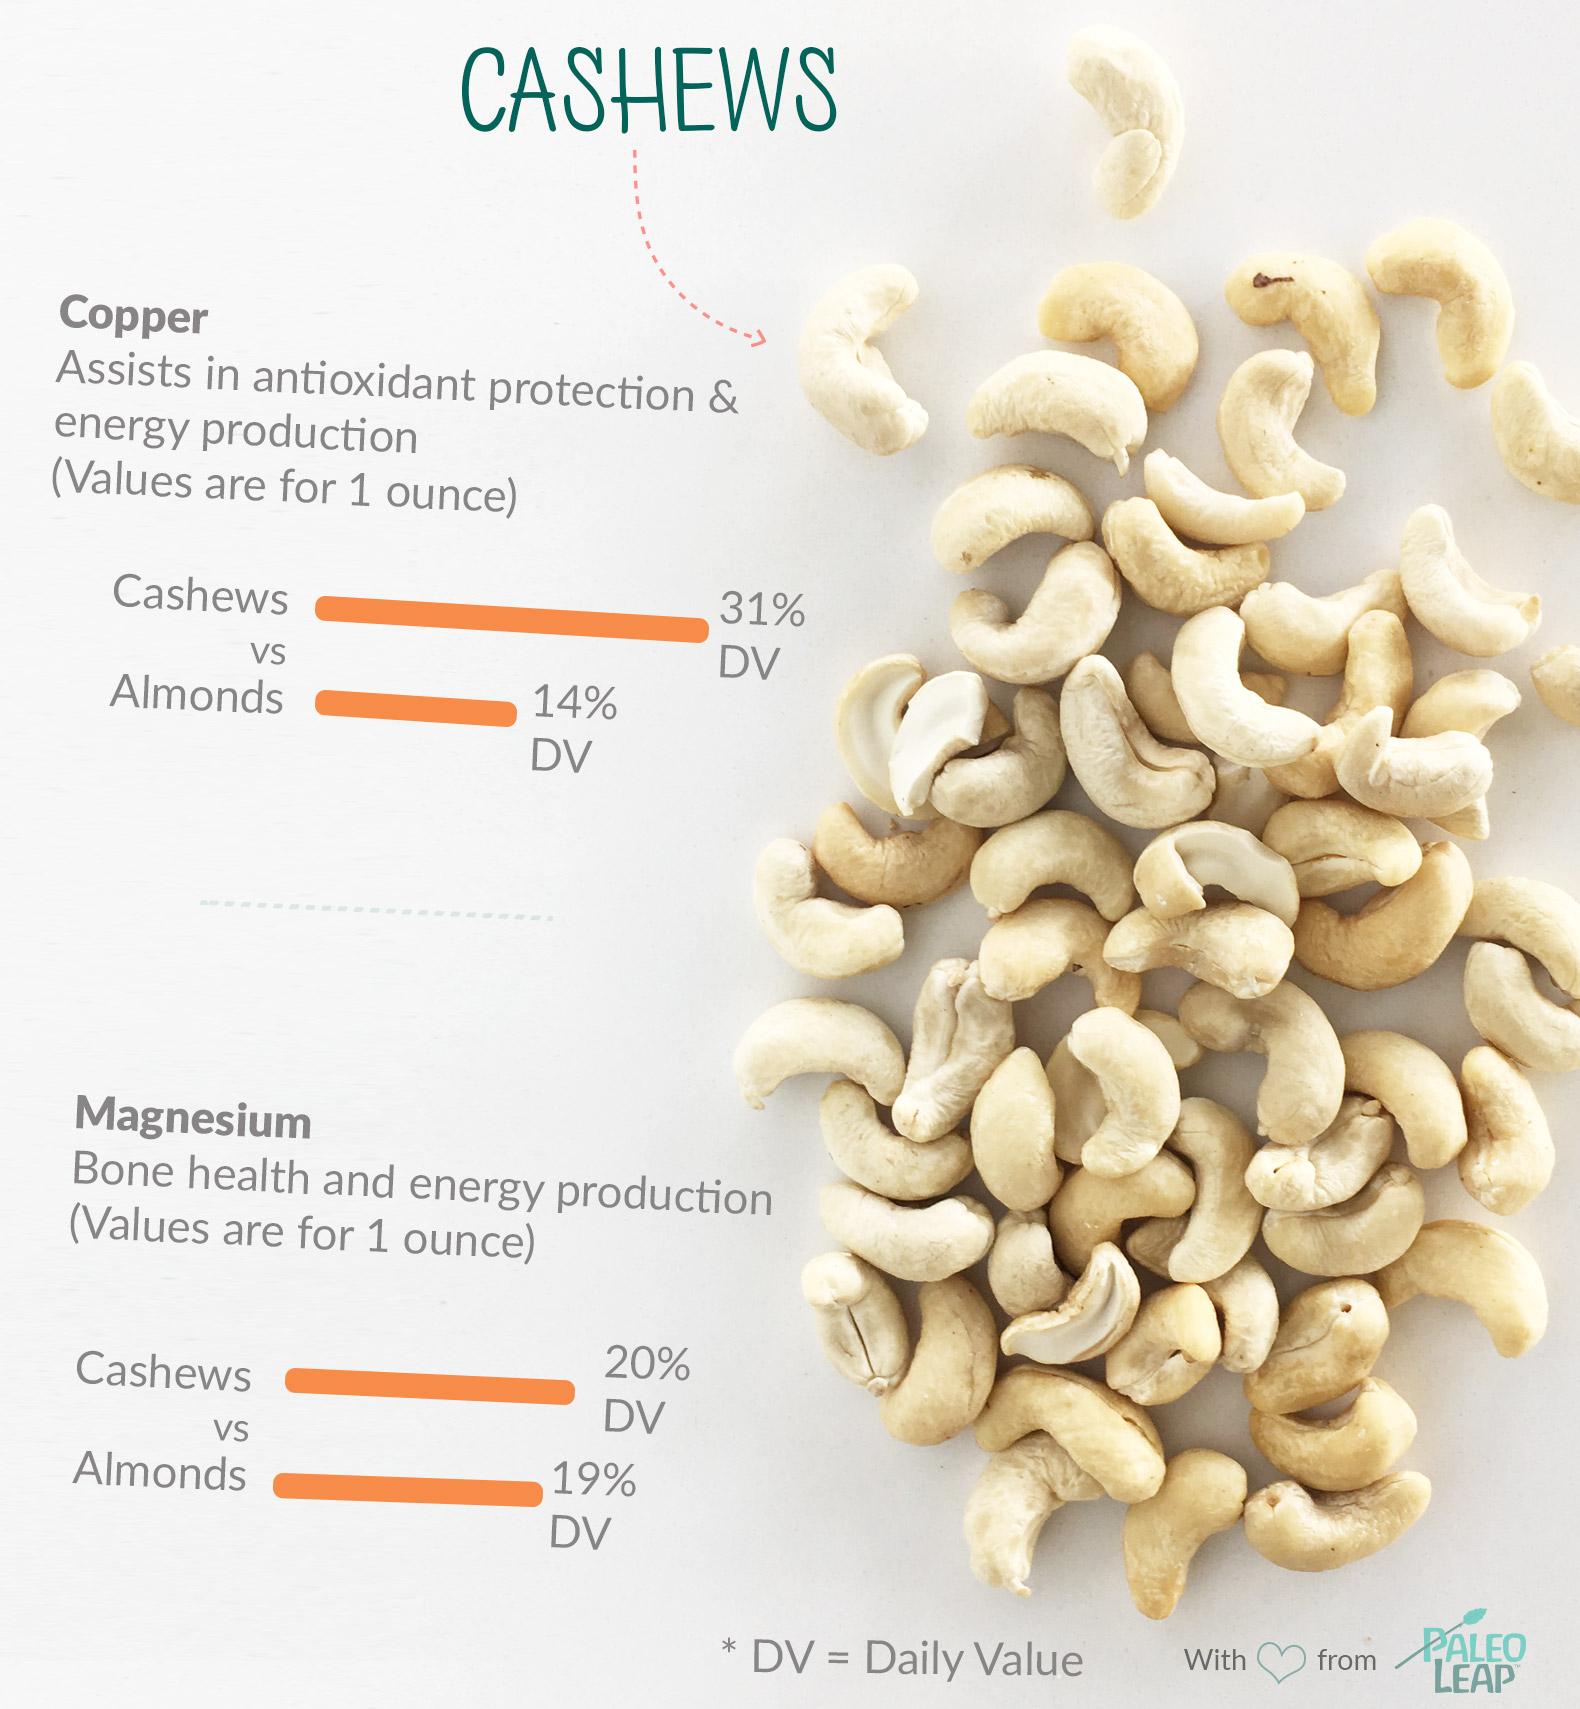 Cashew highlights